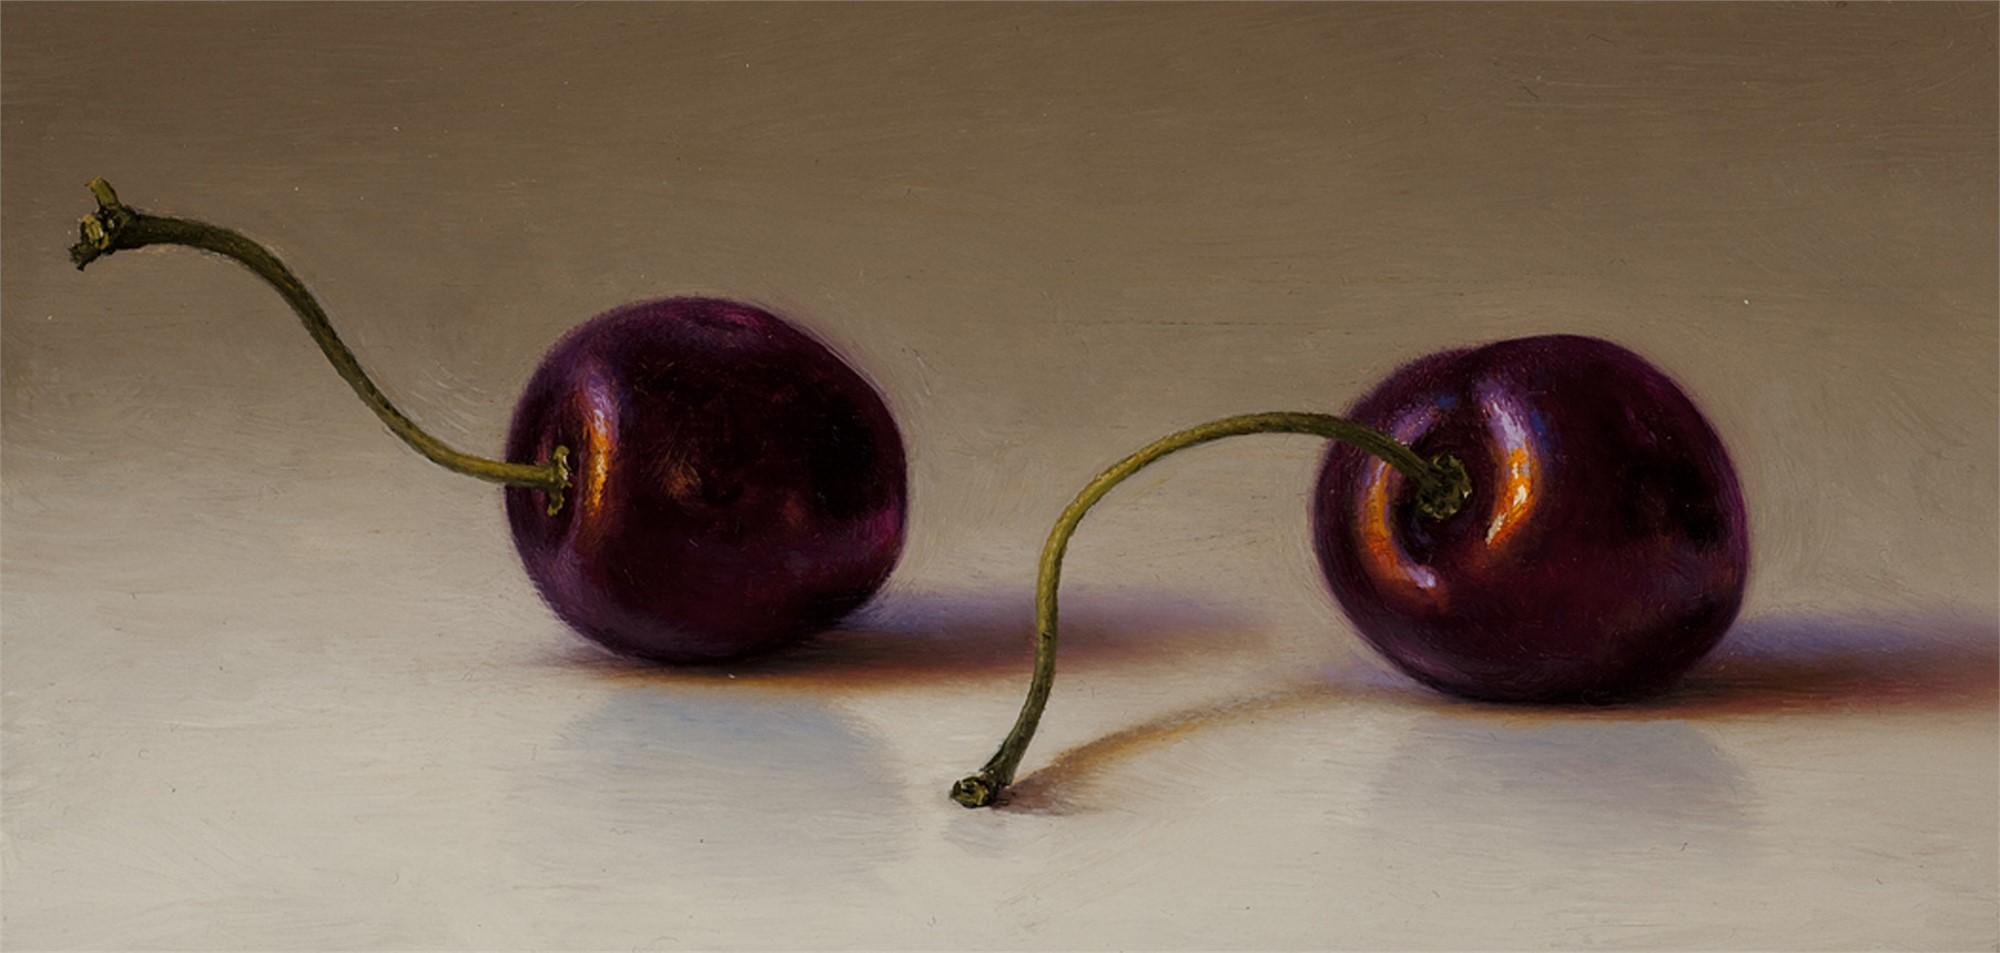 Two Bing Cherries by Scott Fraser